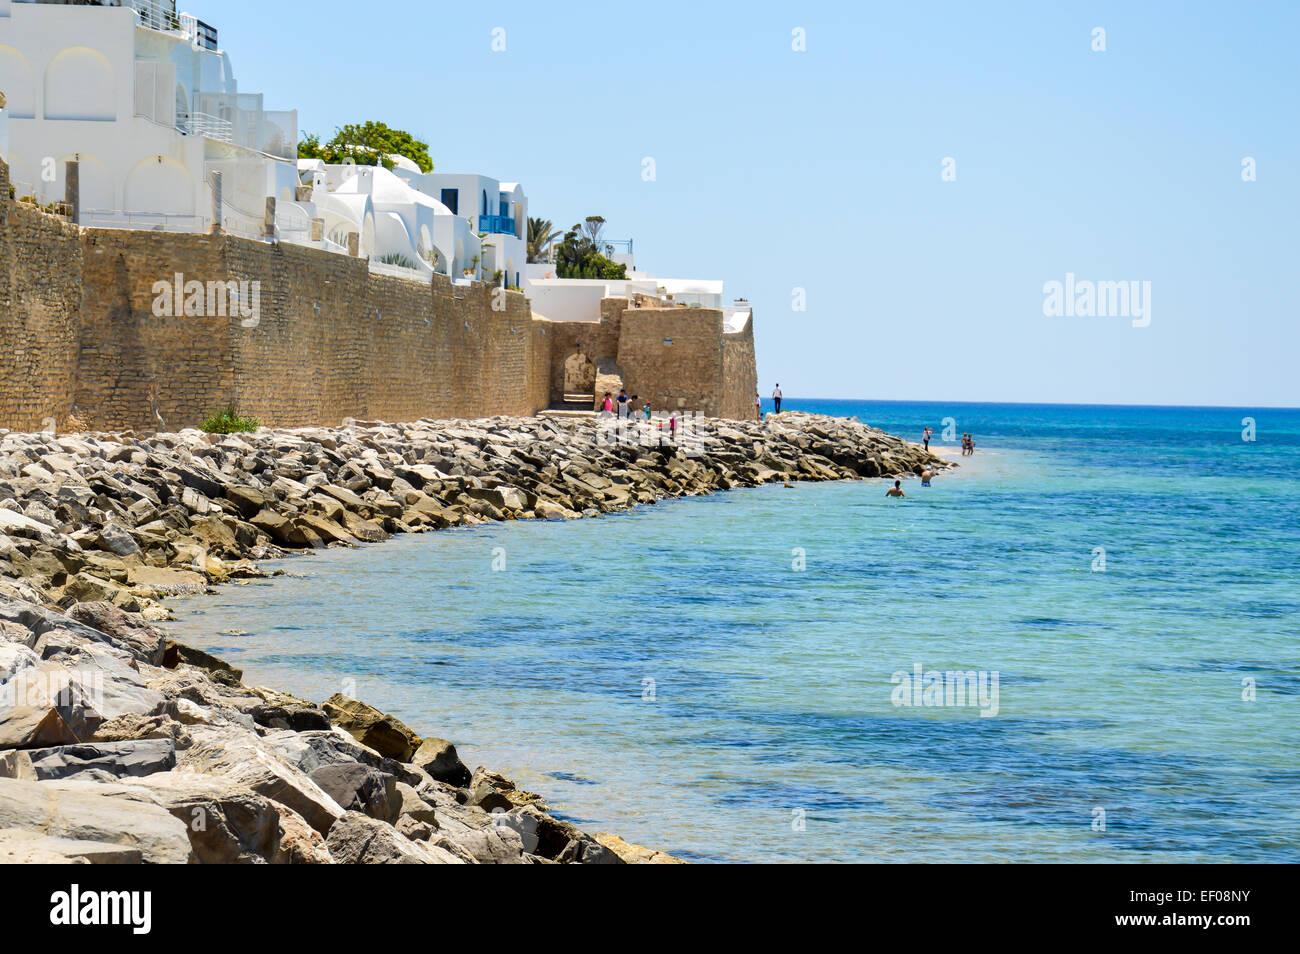 Linea di costa di Hammamet in Tunisia Immagini Stock